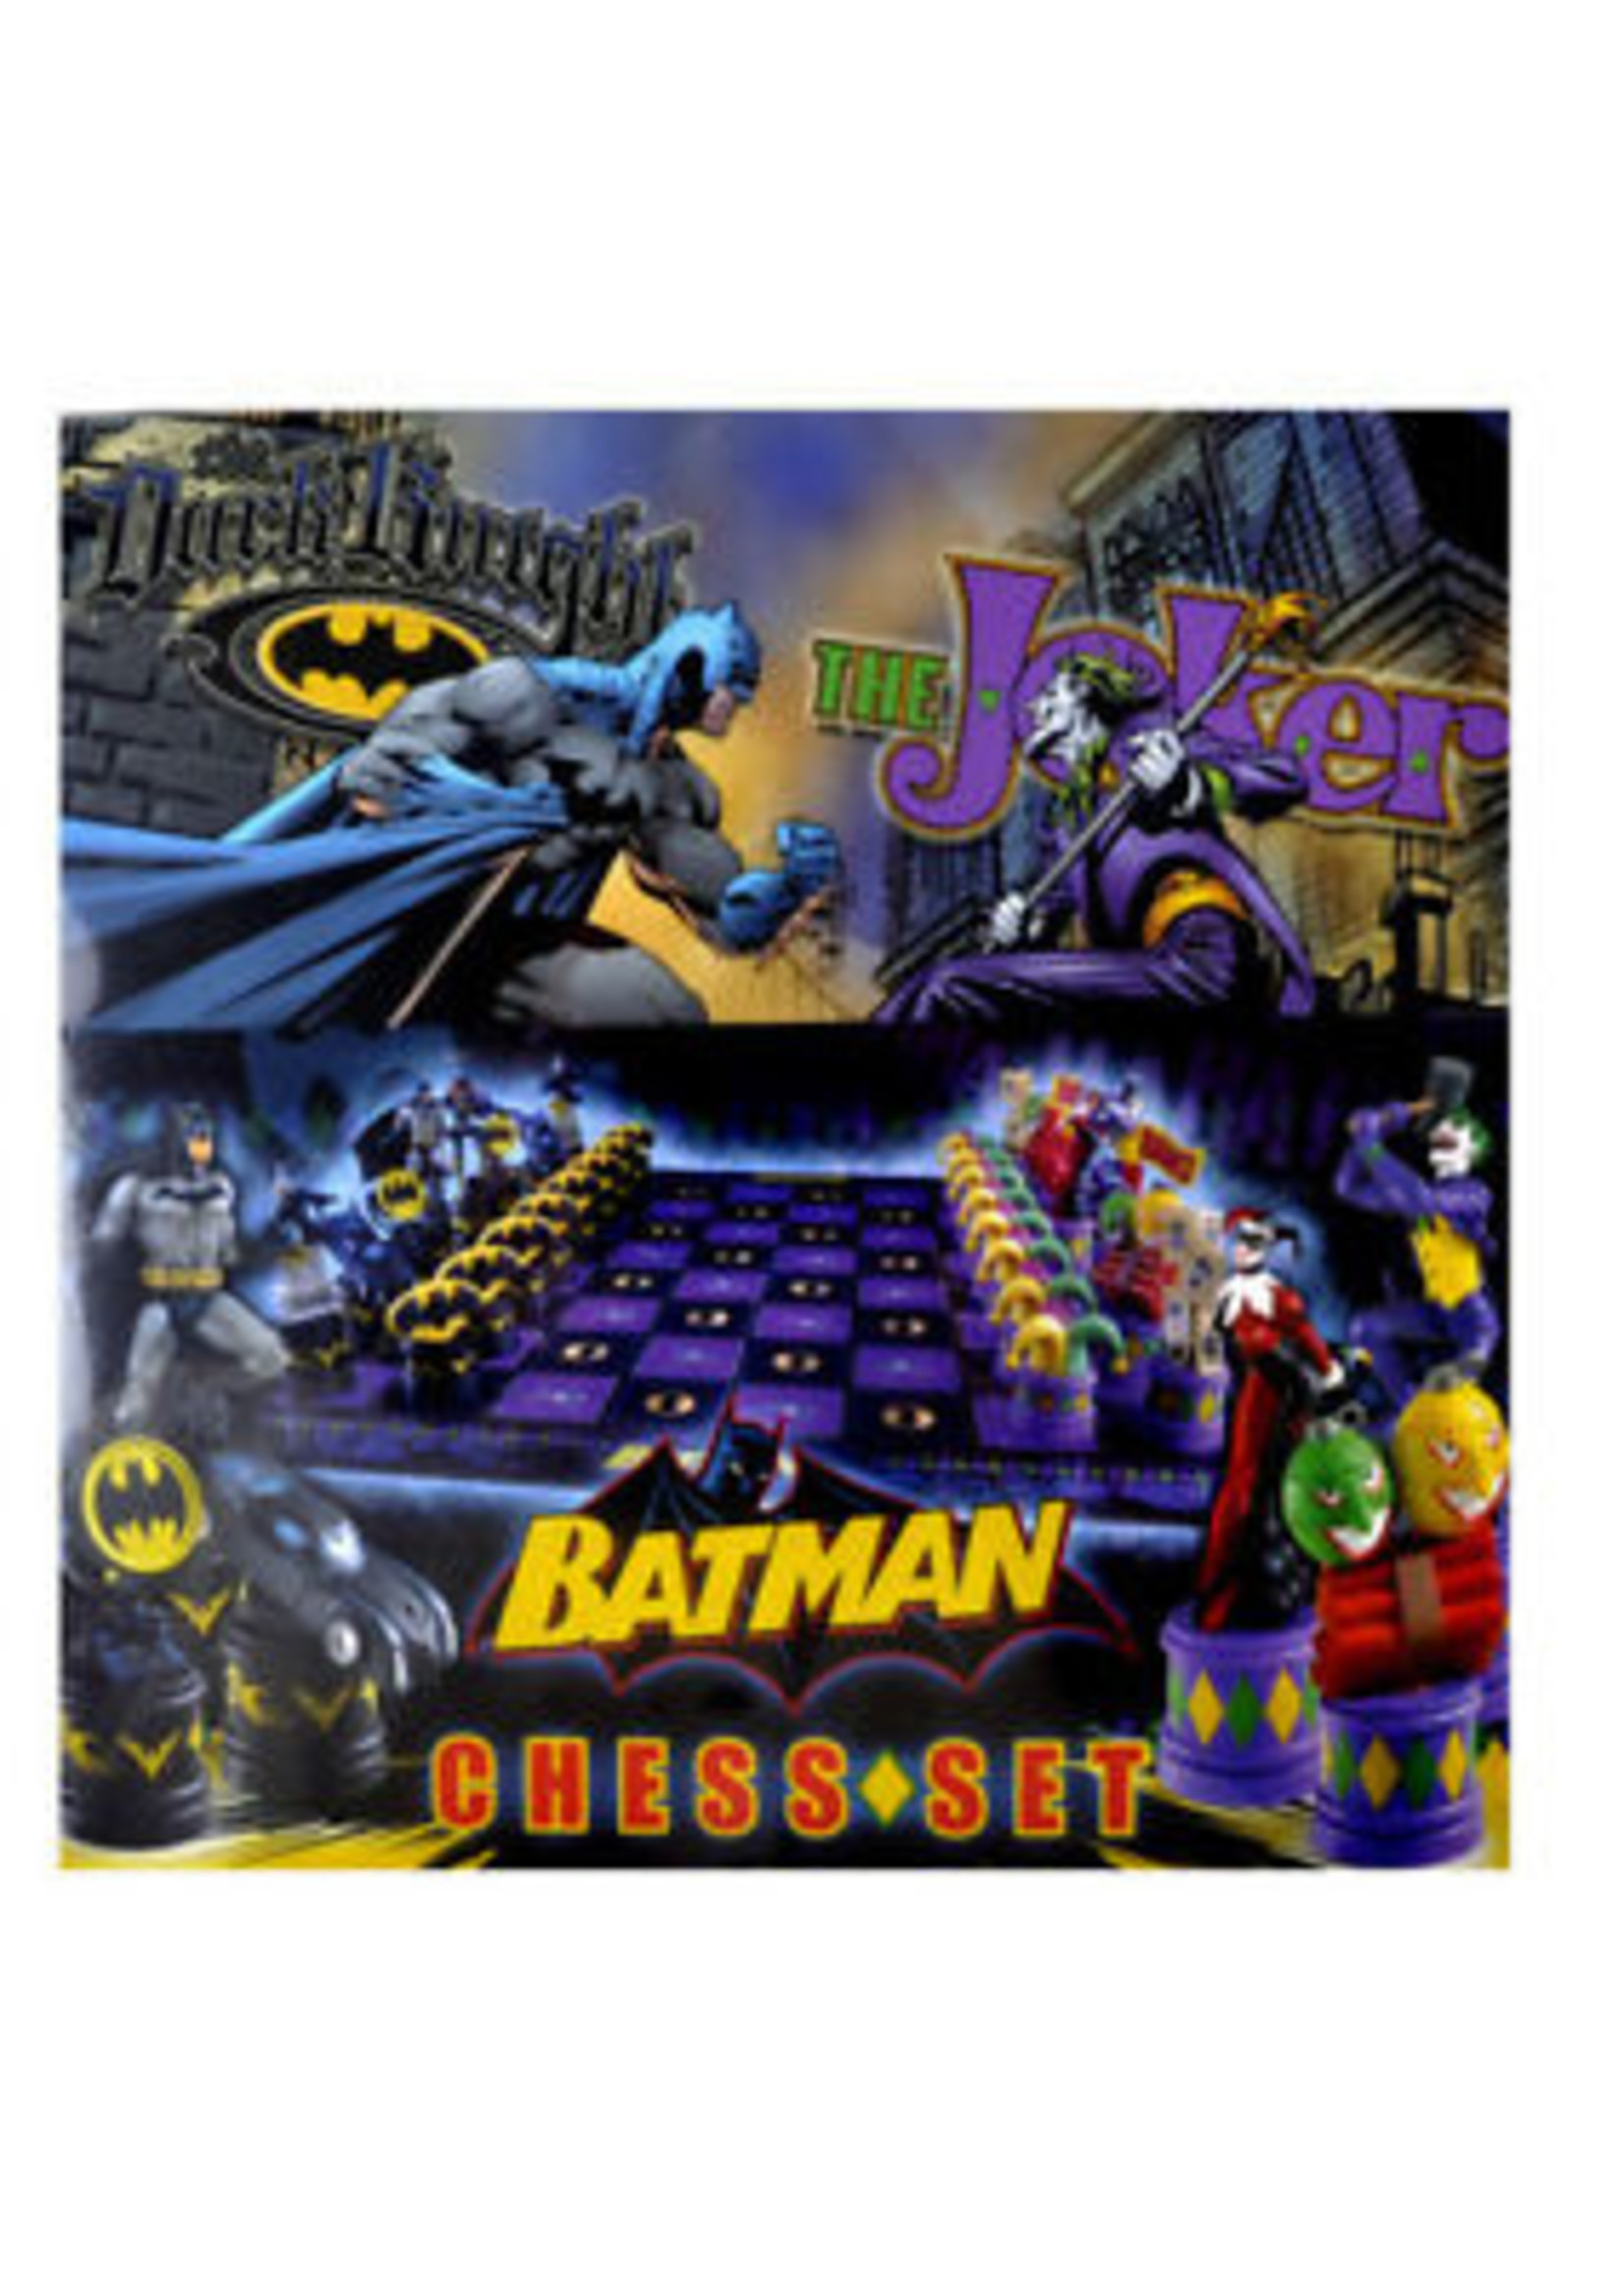 Batman vs Joker Chess Set